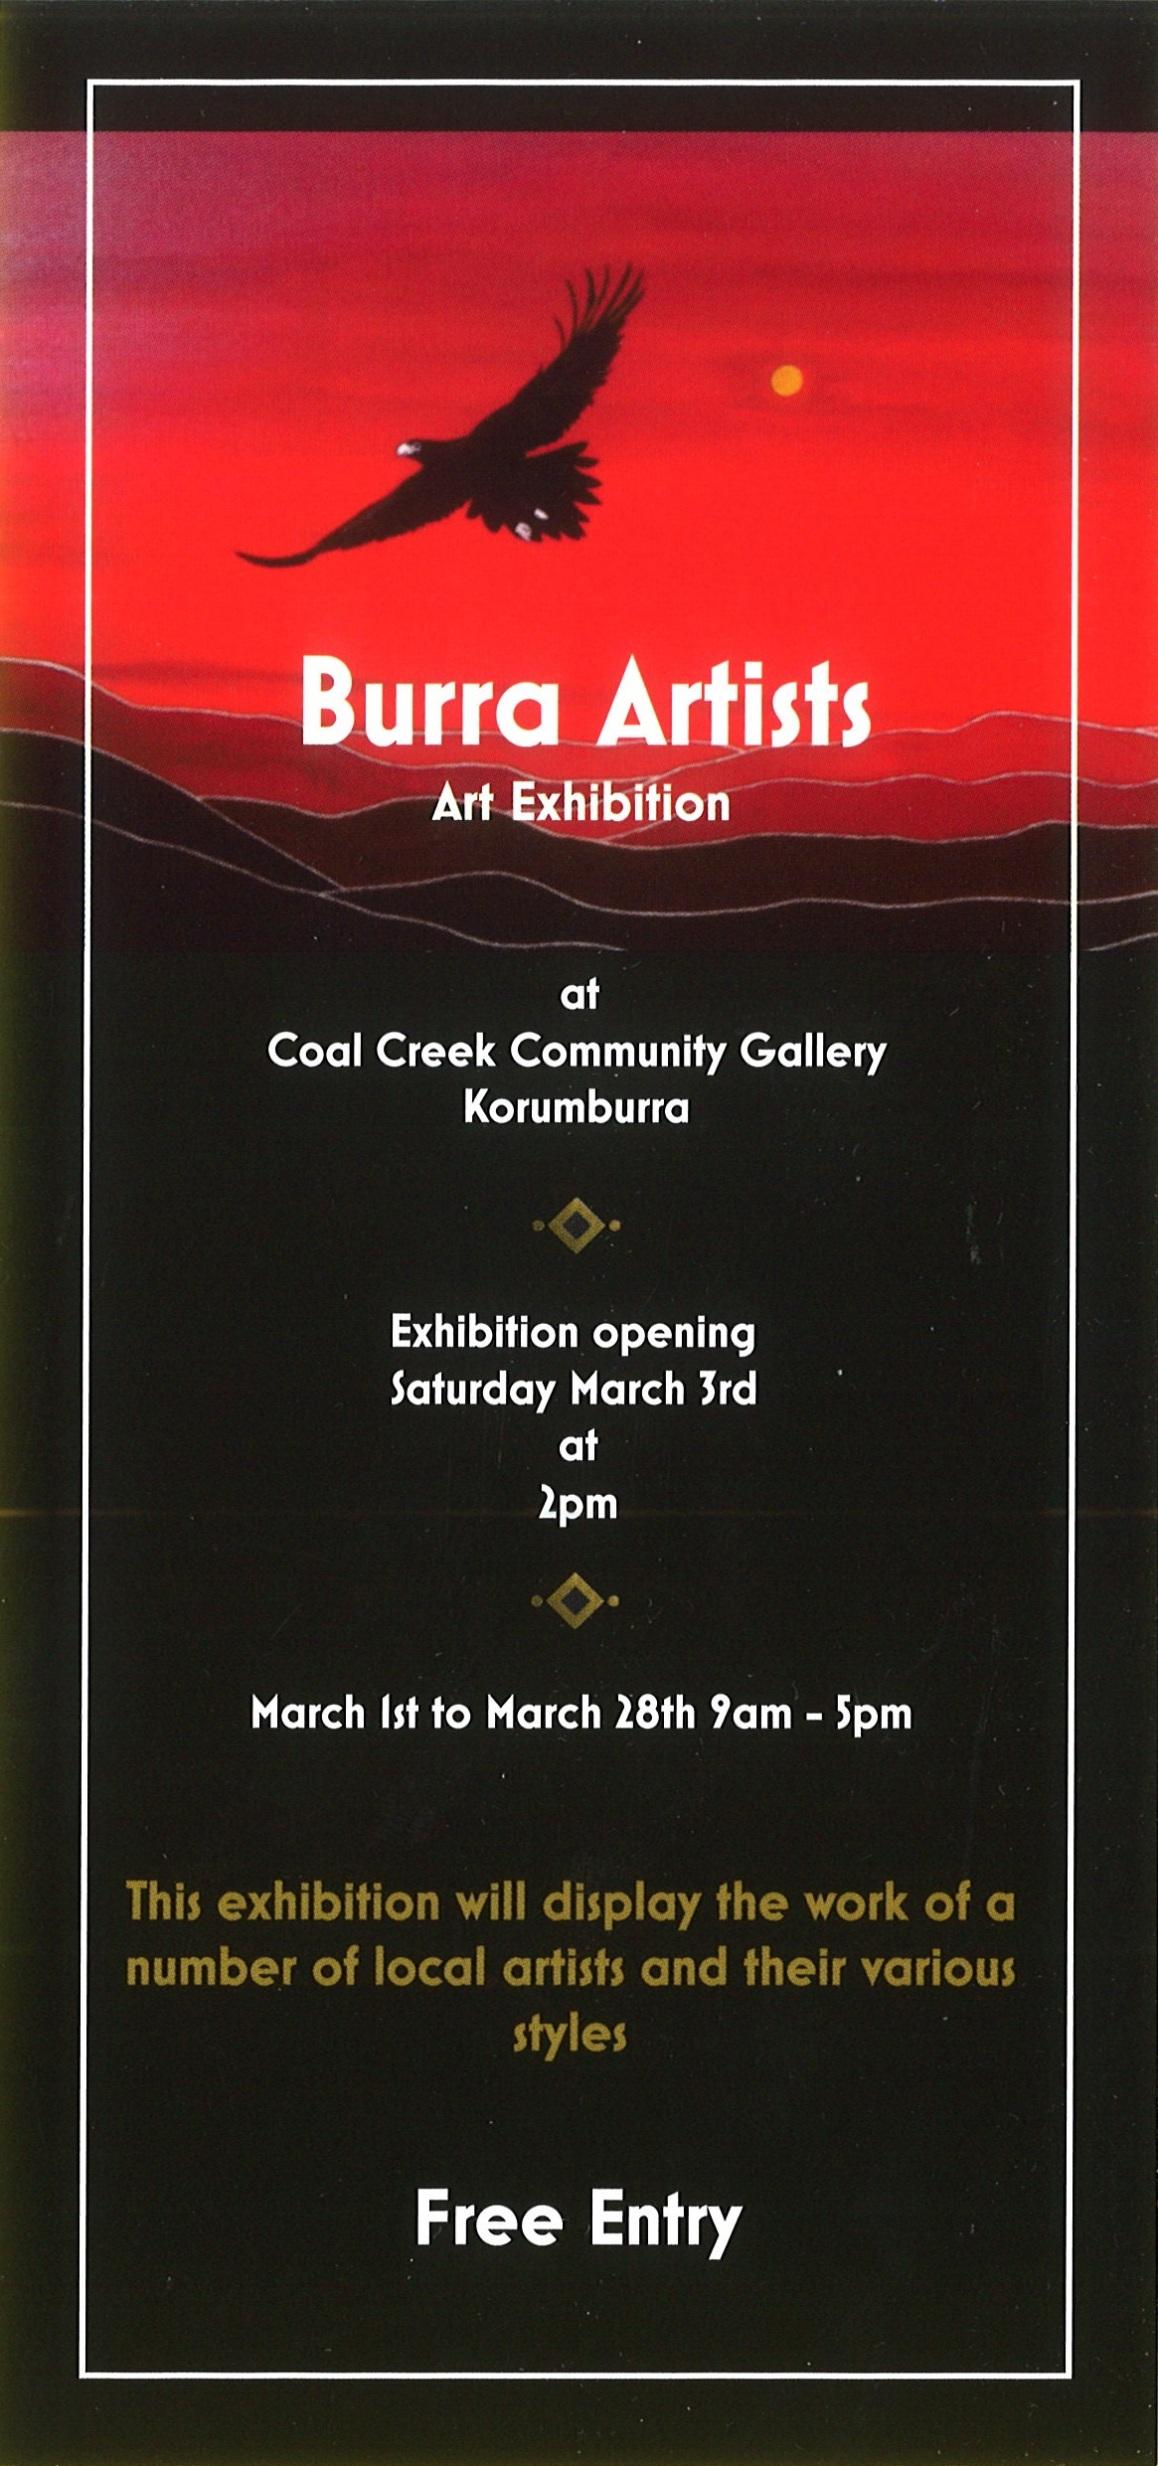 Burra Artists Flyer.jpg